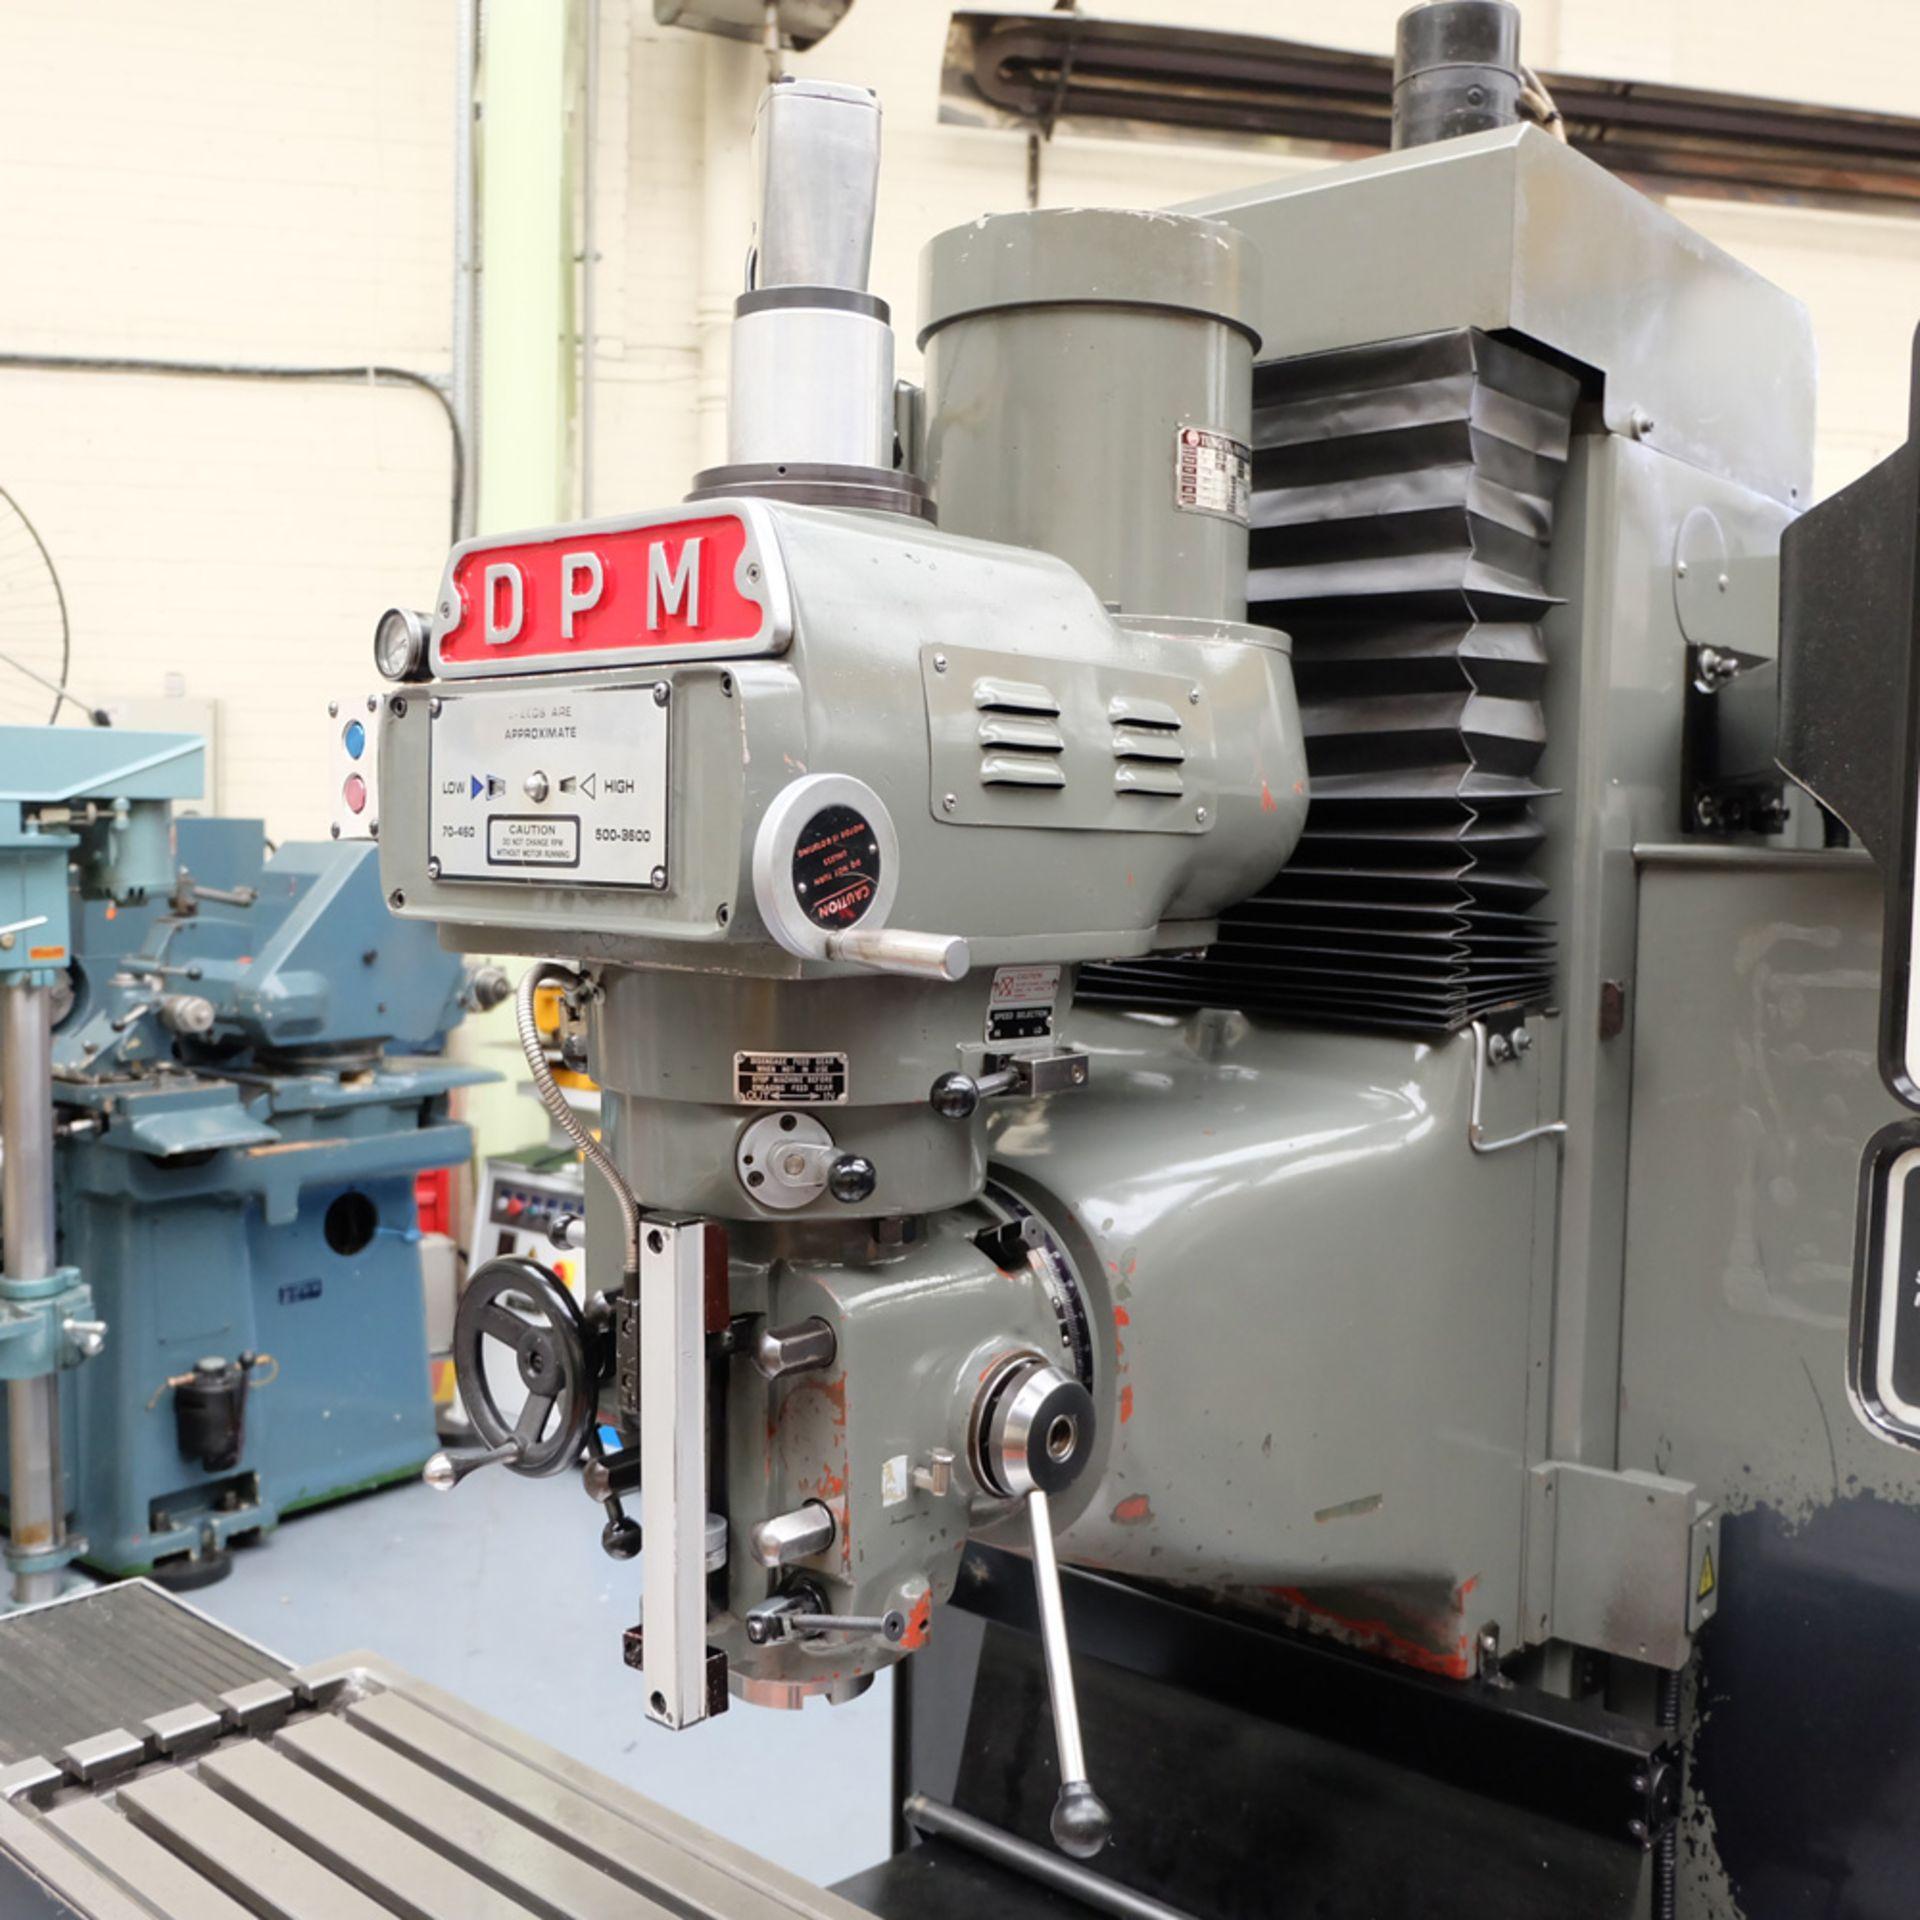 XYZ DPM Bed Mill with ProtoTRAK A.G.E. 3 Control. Prototrak A.G.E. - Image 3 of 10